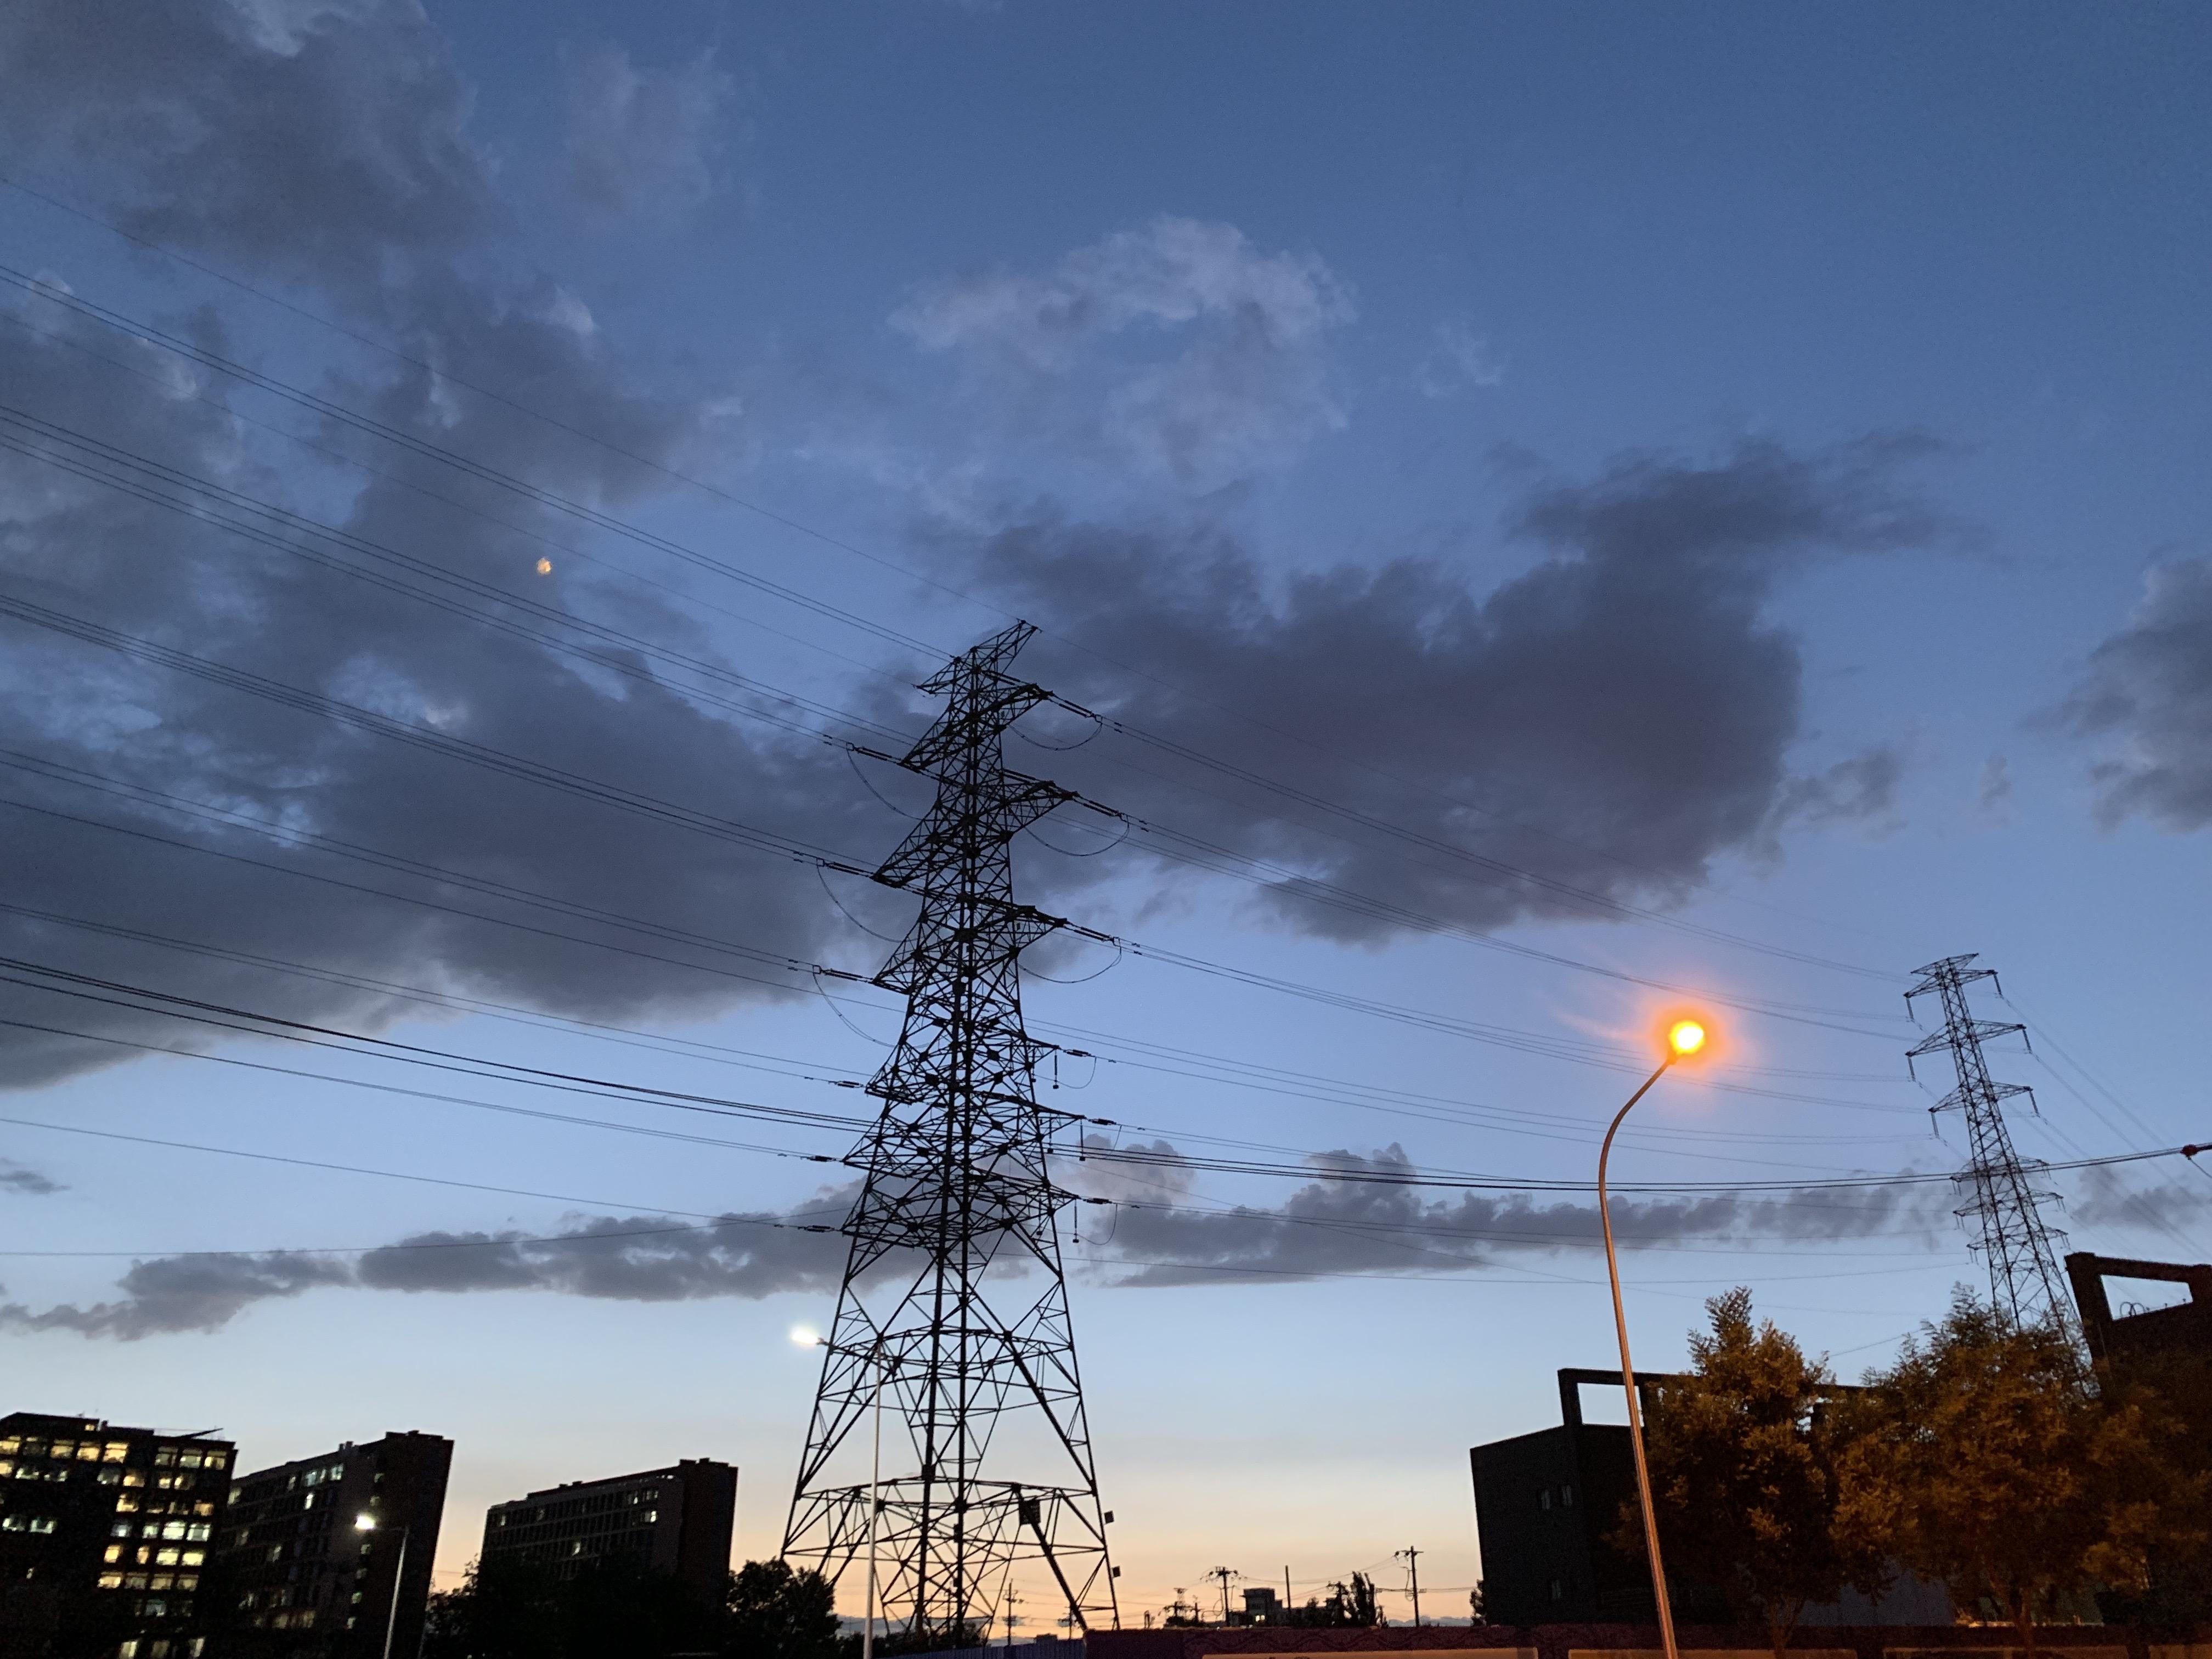 nightfall.jpg